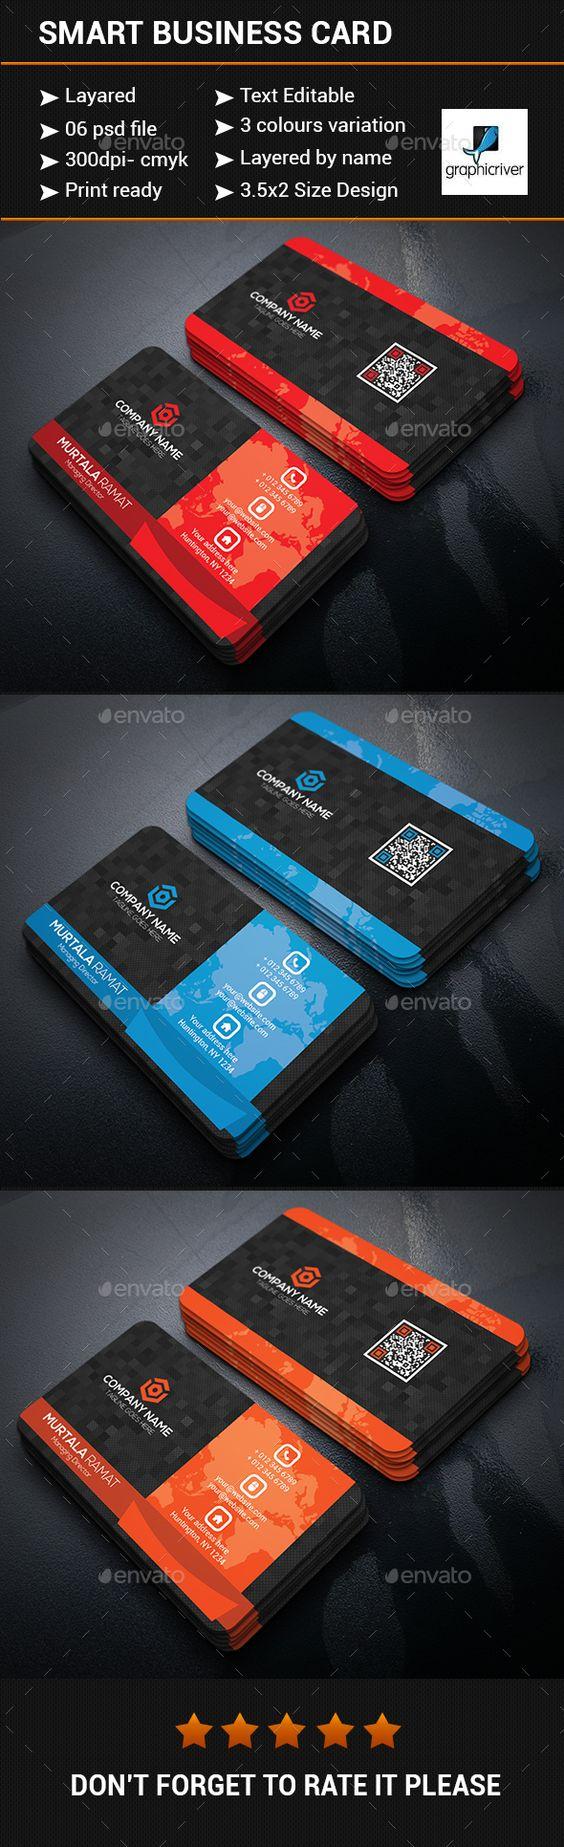 Smart Business Card Design - Business Cards Print Templates